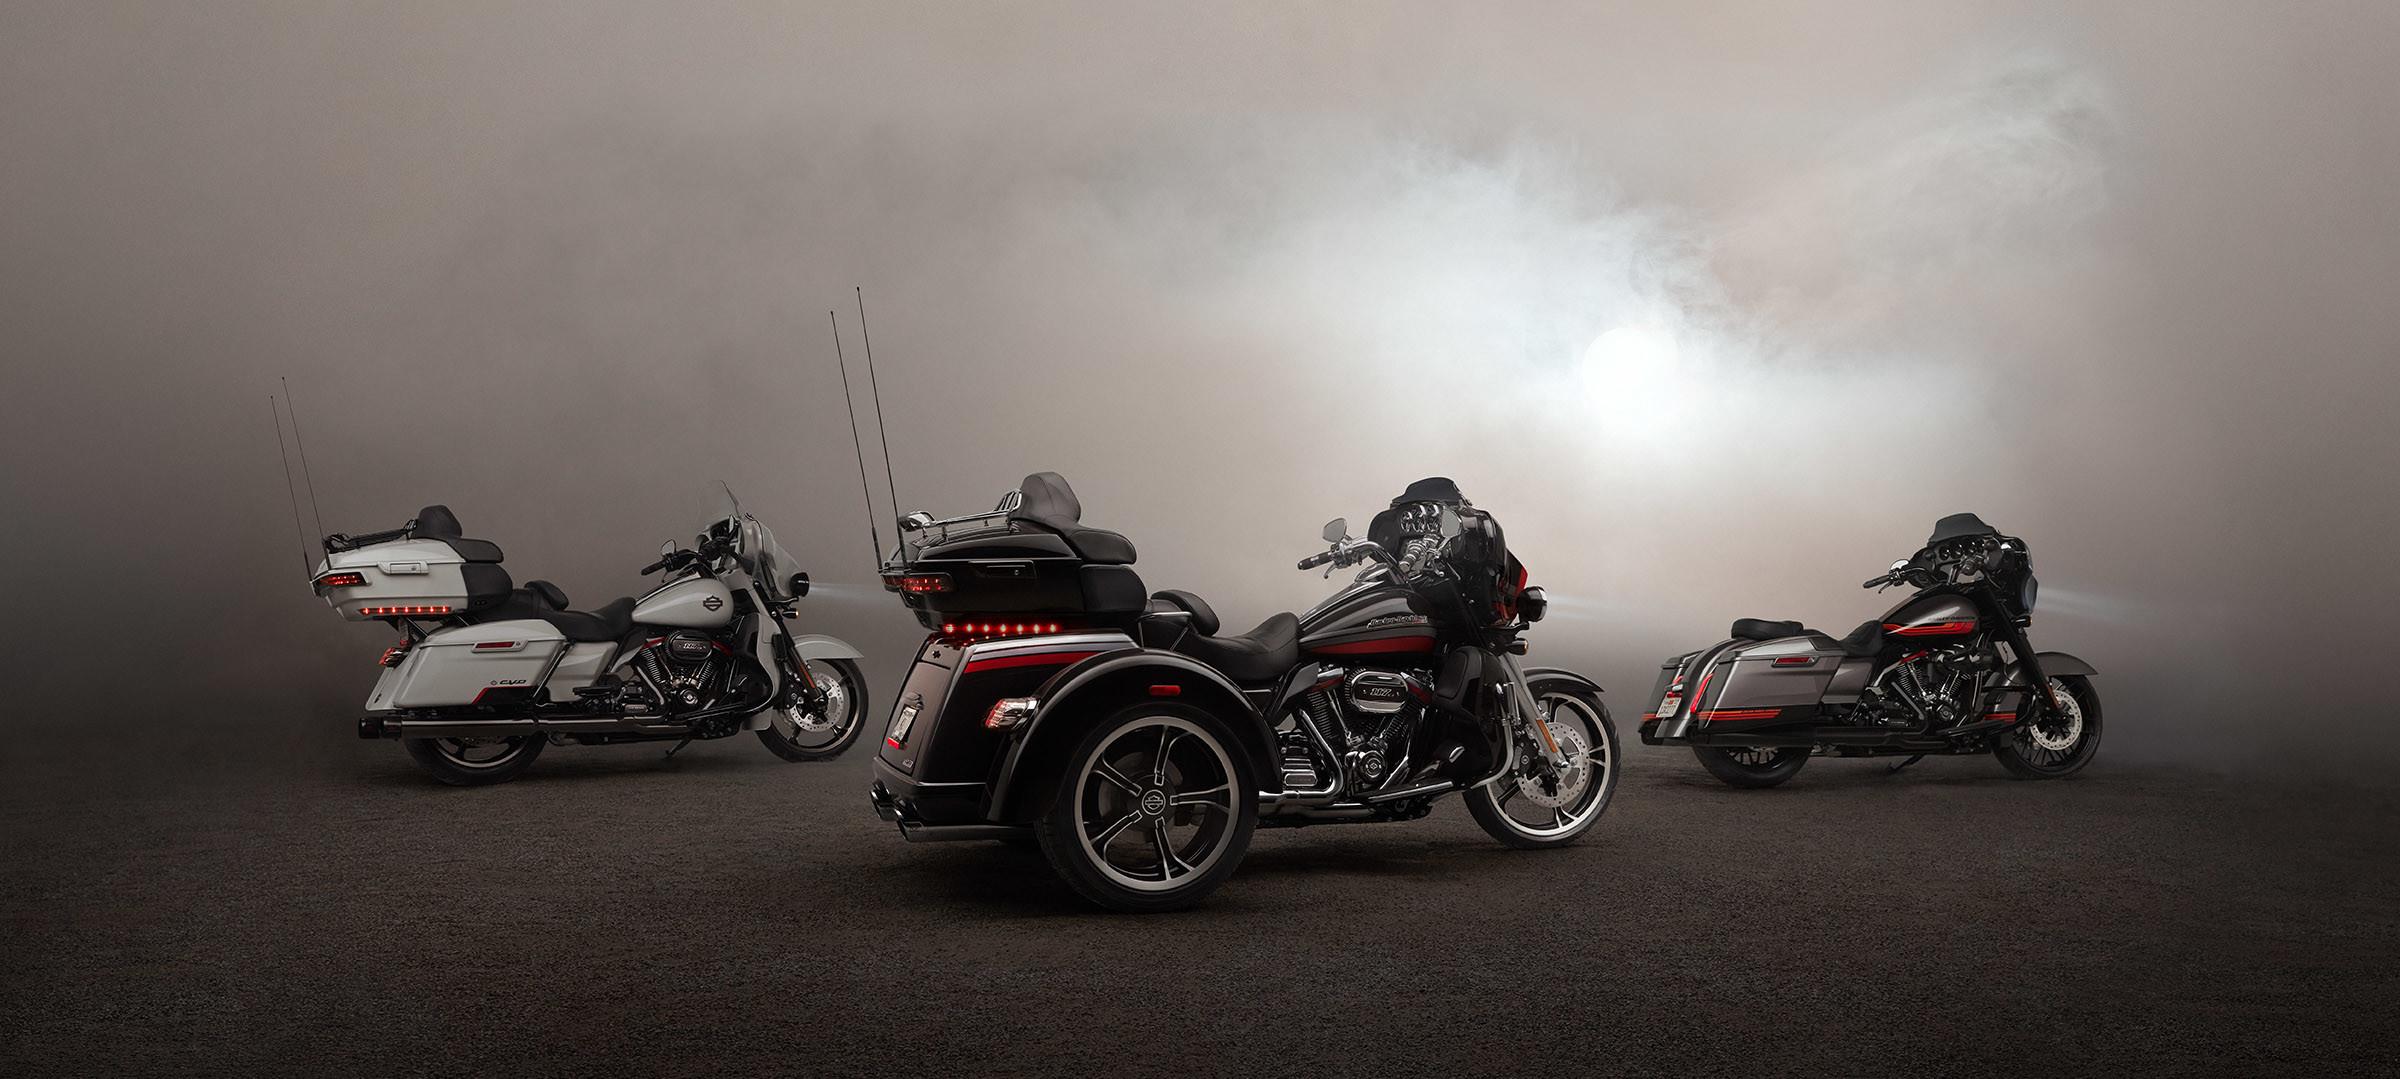 Homepage   Dallas Harley-Davidson®, Garland